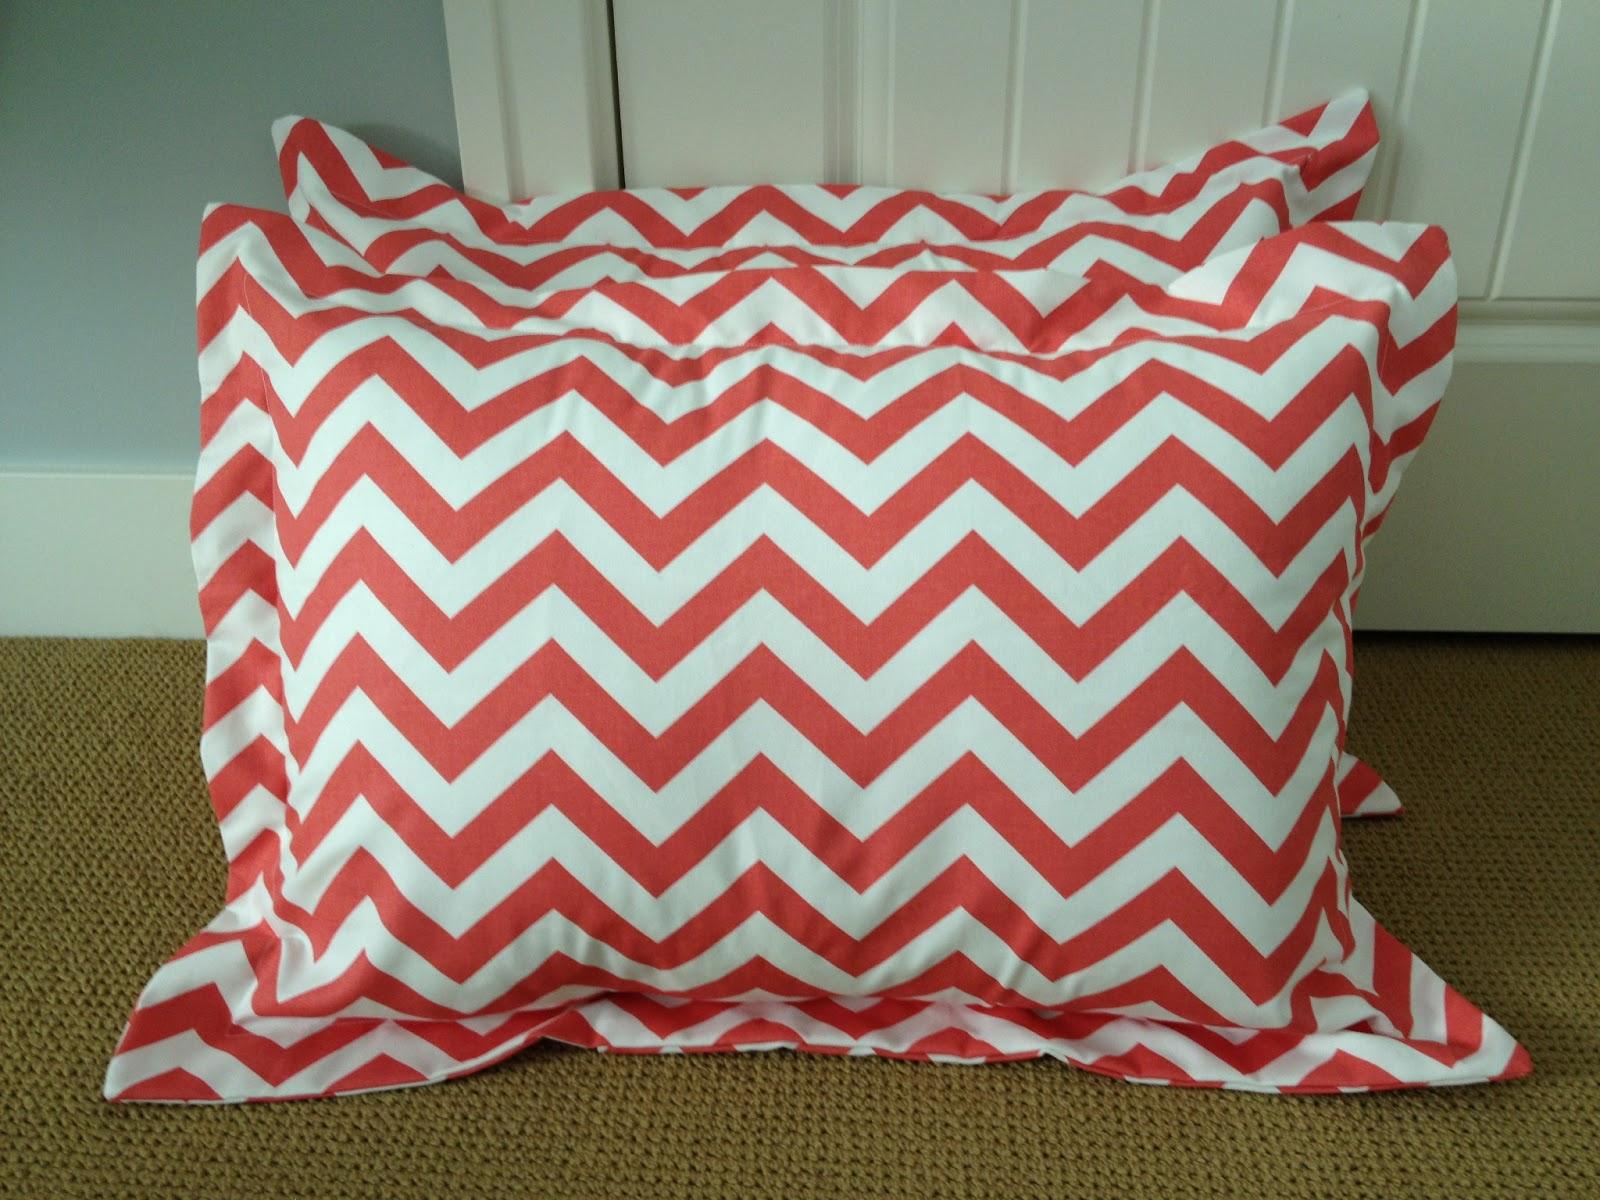 & Cora Anne Designs: DIY Pillow Sham Tutorial pillowsntoast.com